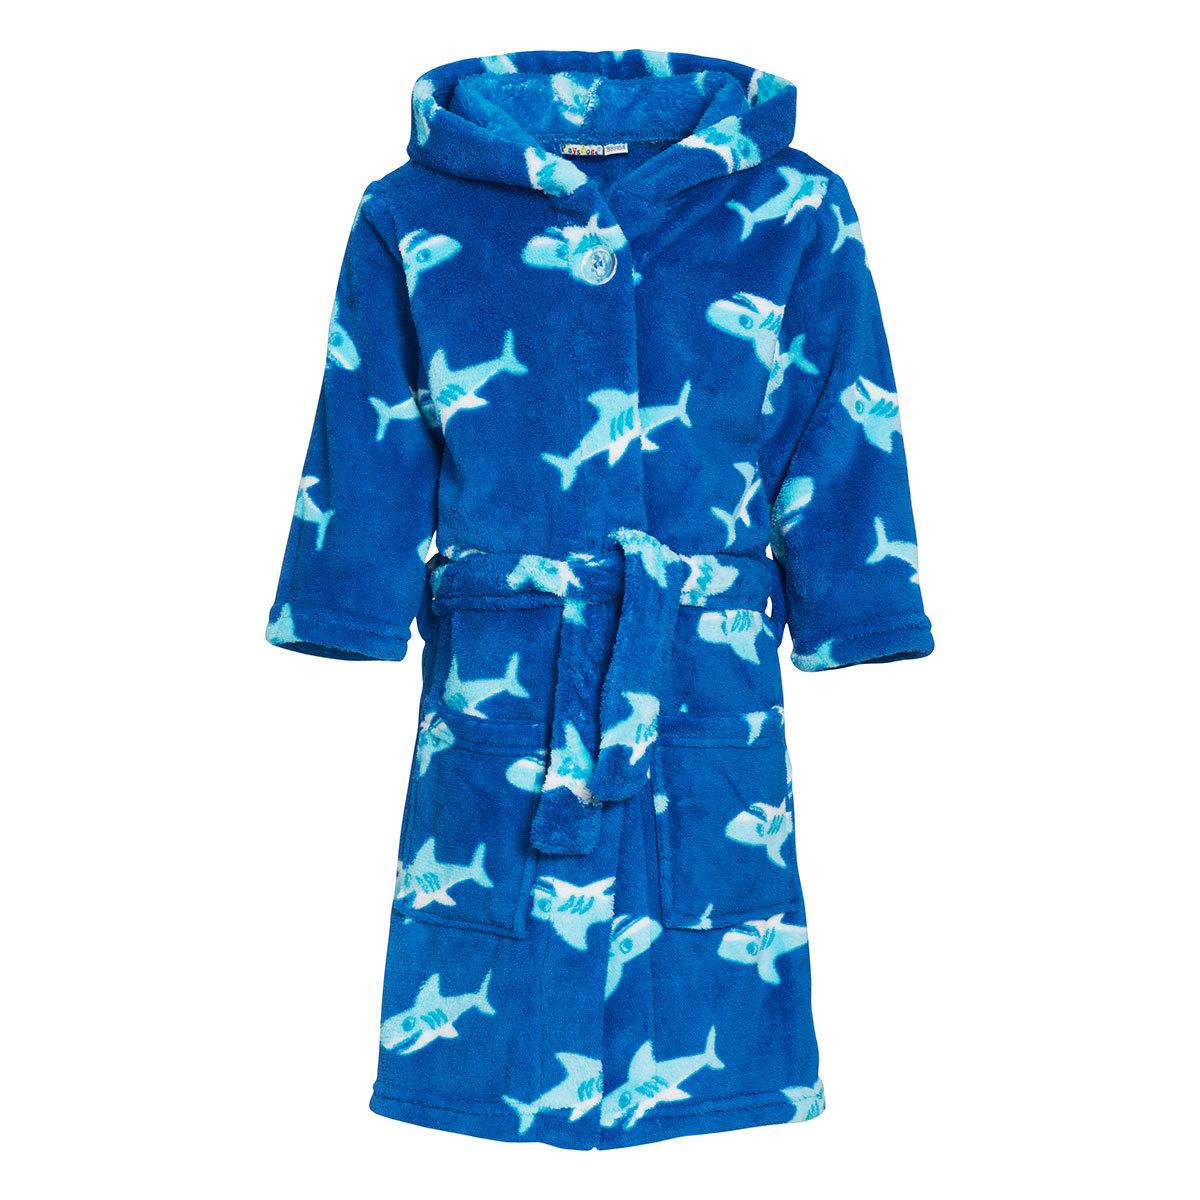 Playshoes Kinder Fleece Bademantel Hai blau